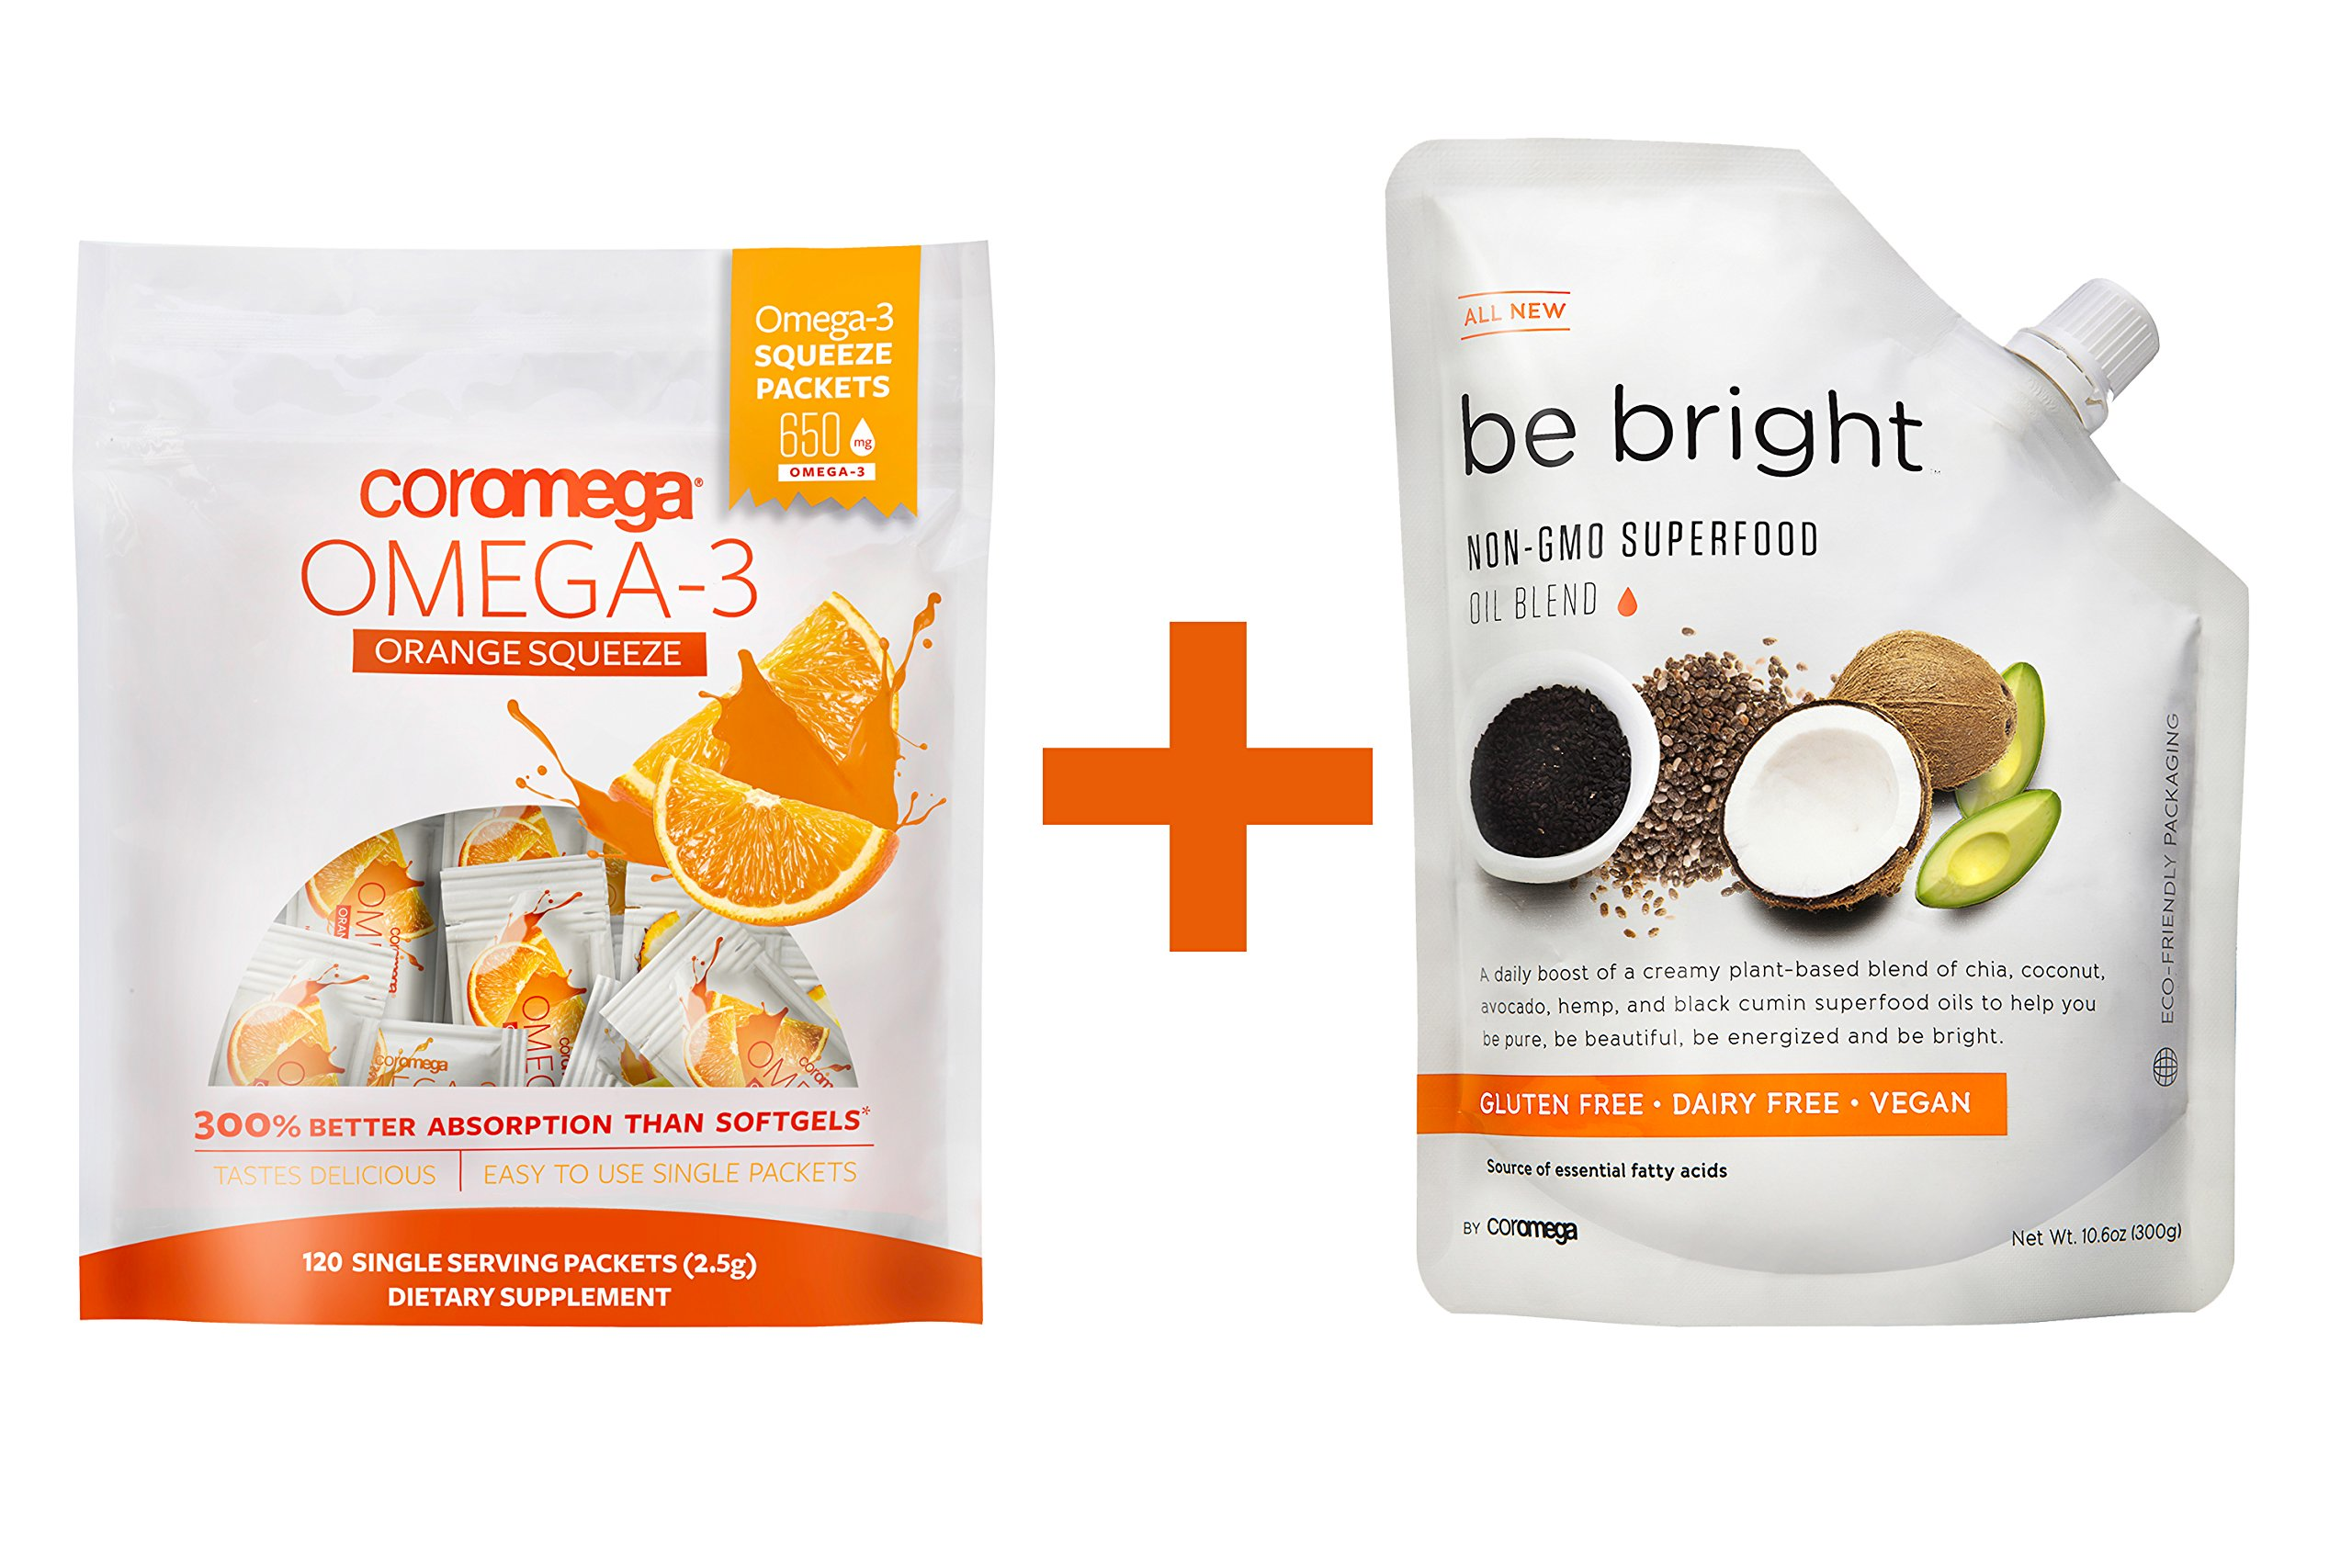 Coromega Omega-3 Fish Oil Squeeze Packets, DHA and EPA, Orange, 120-Count